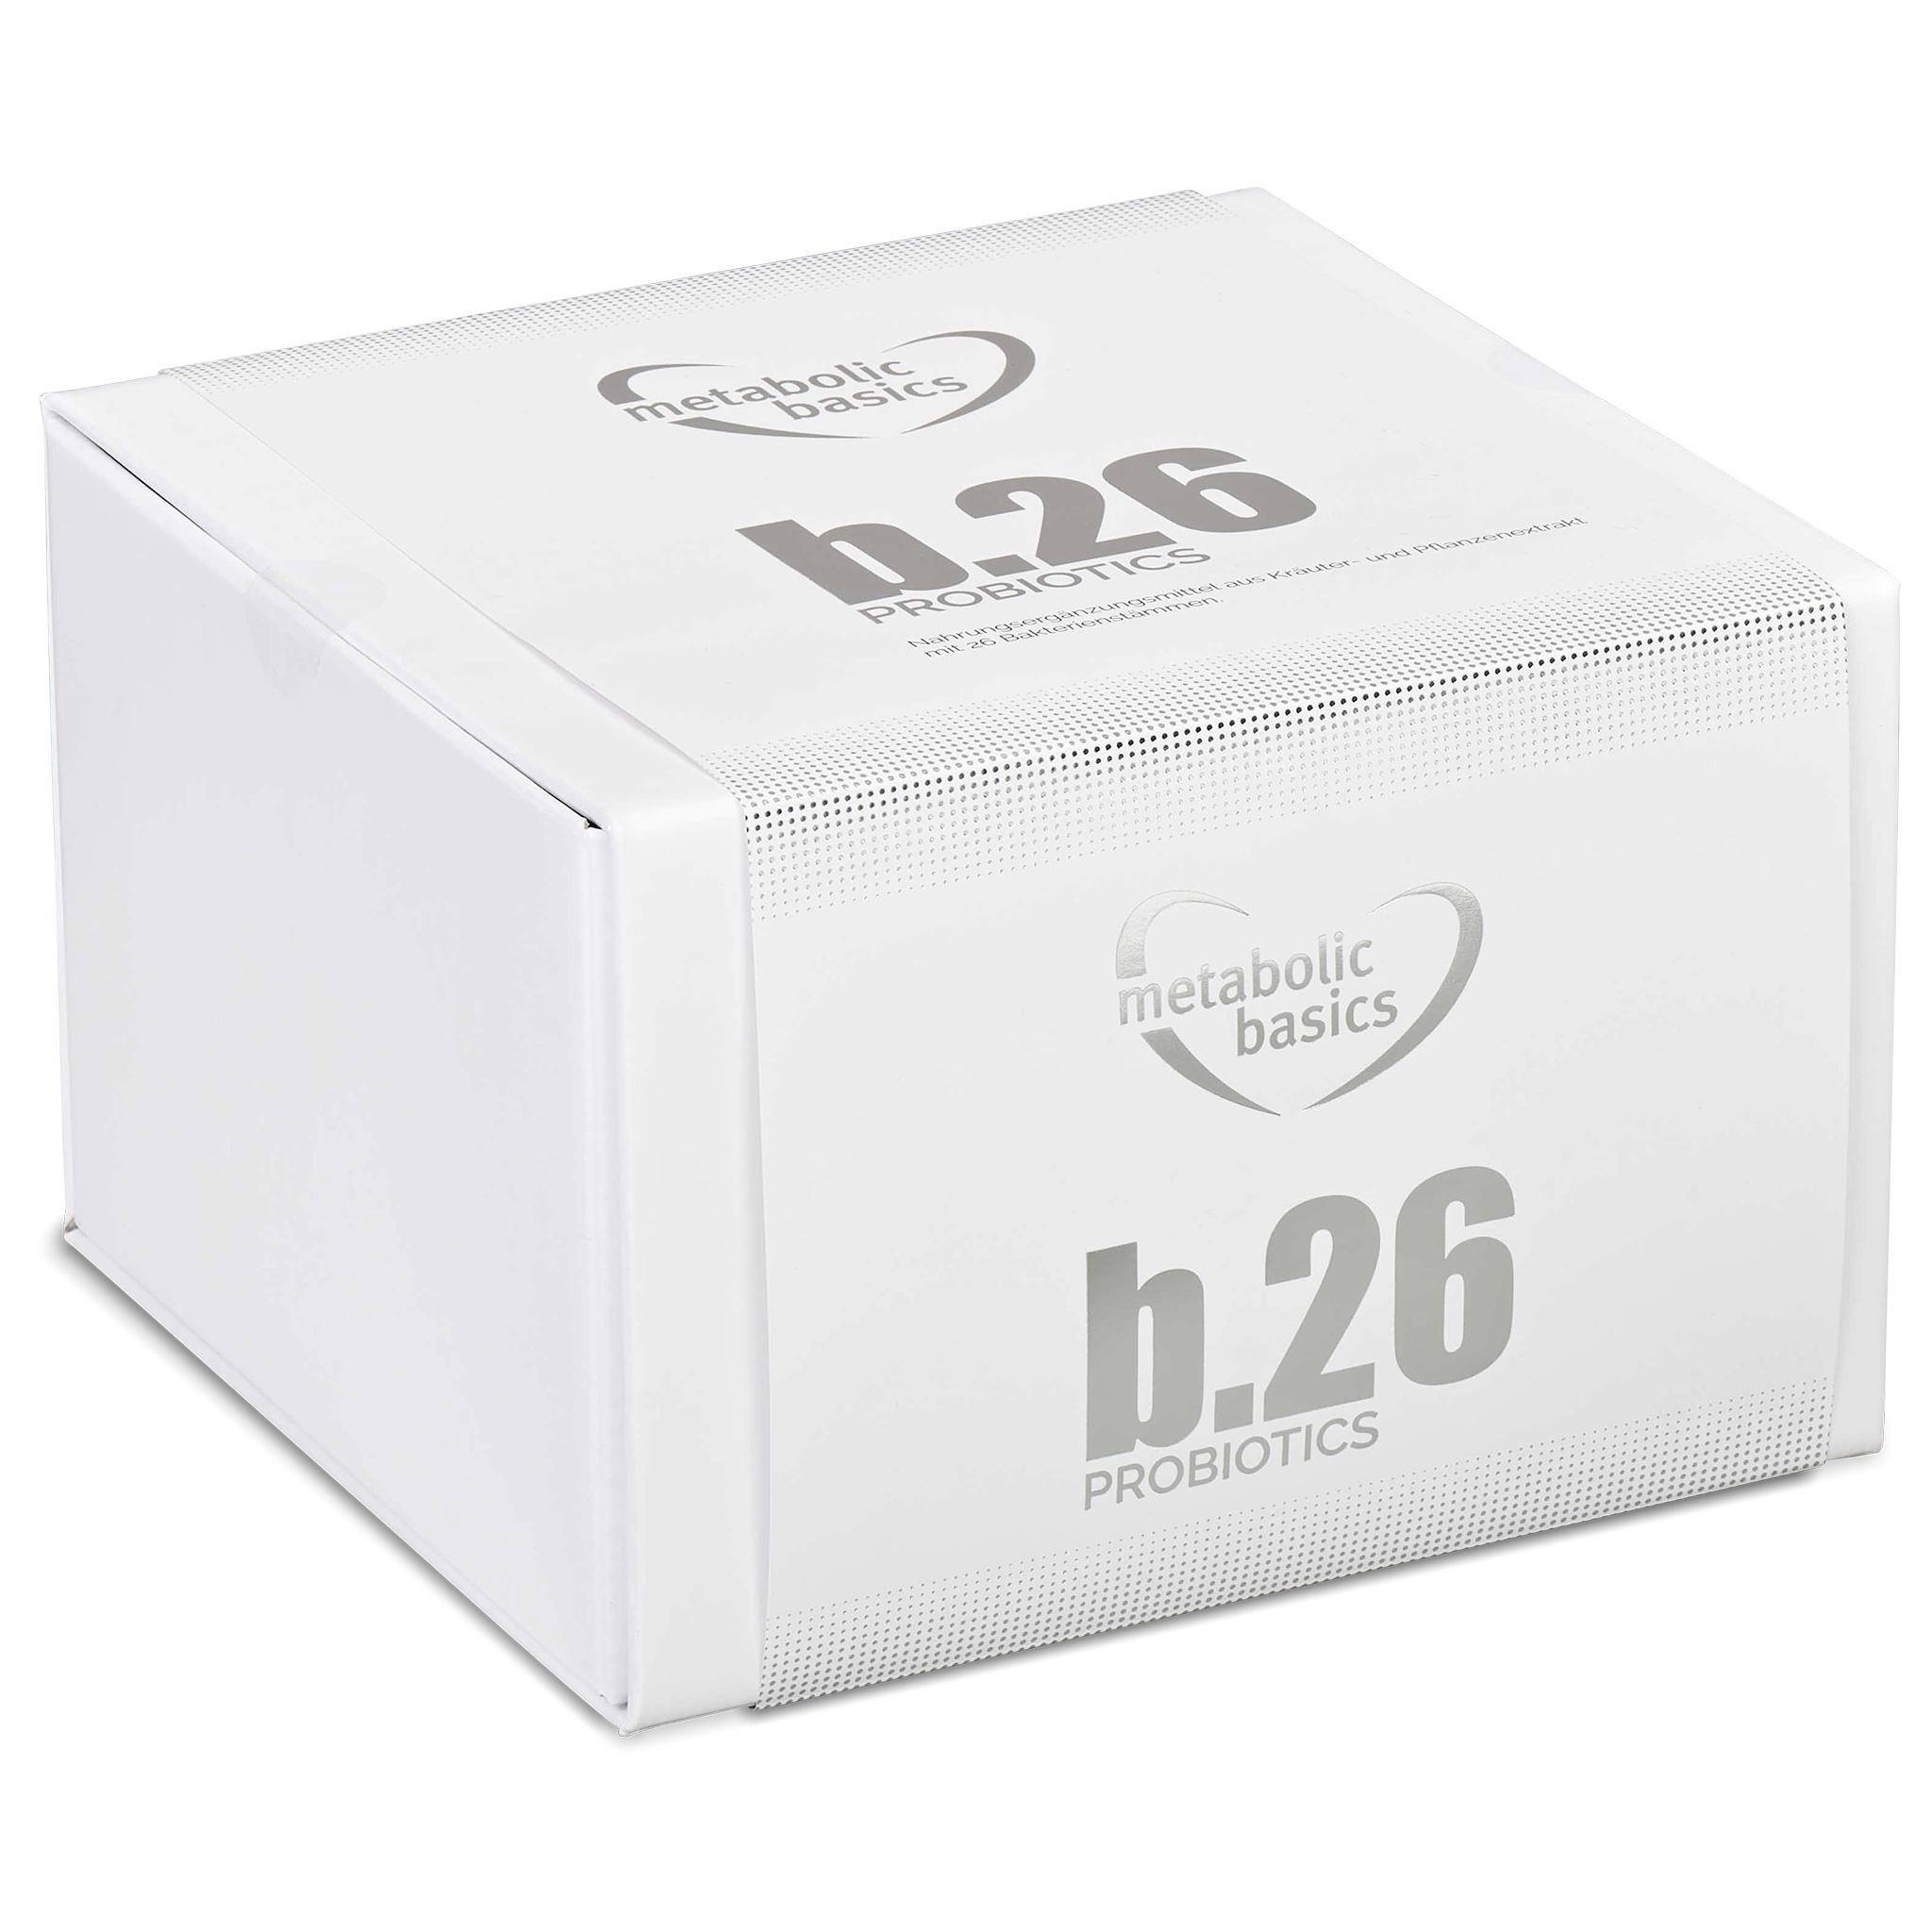 b.26 - Pro Darm